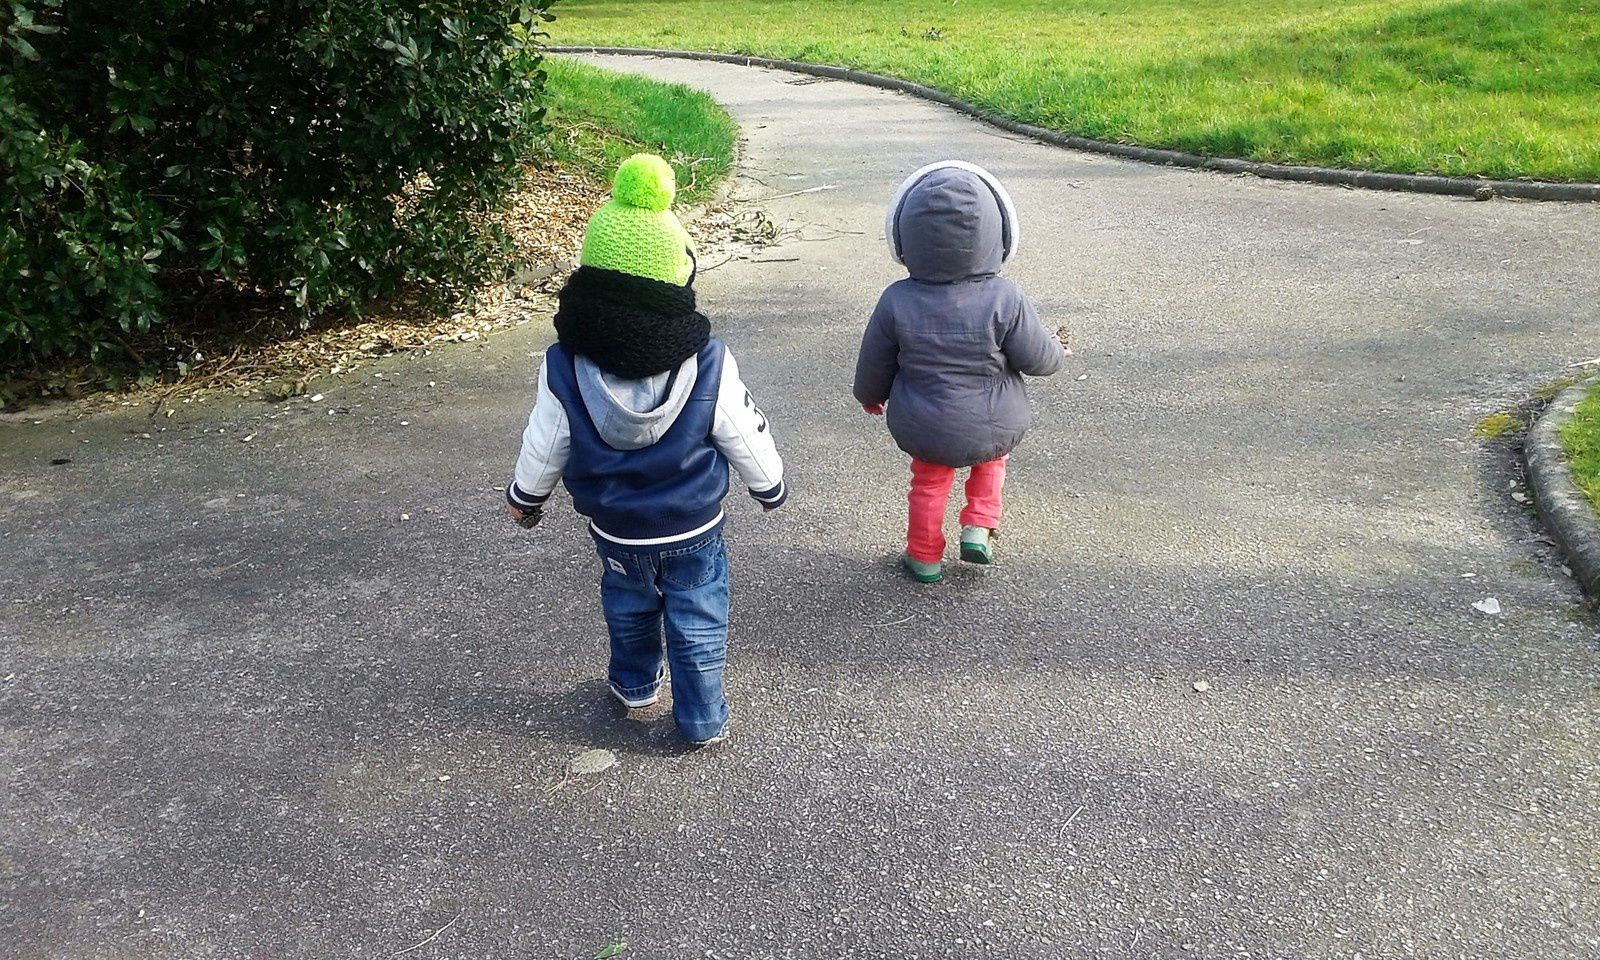 Petite promenade ce matin